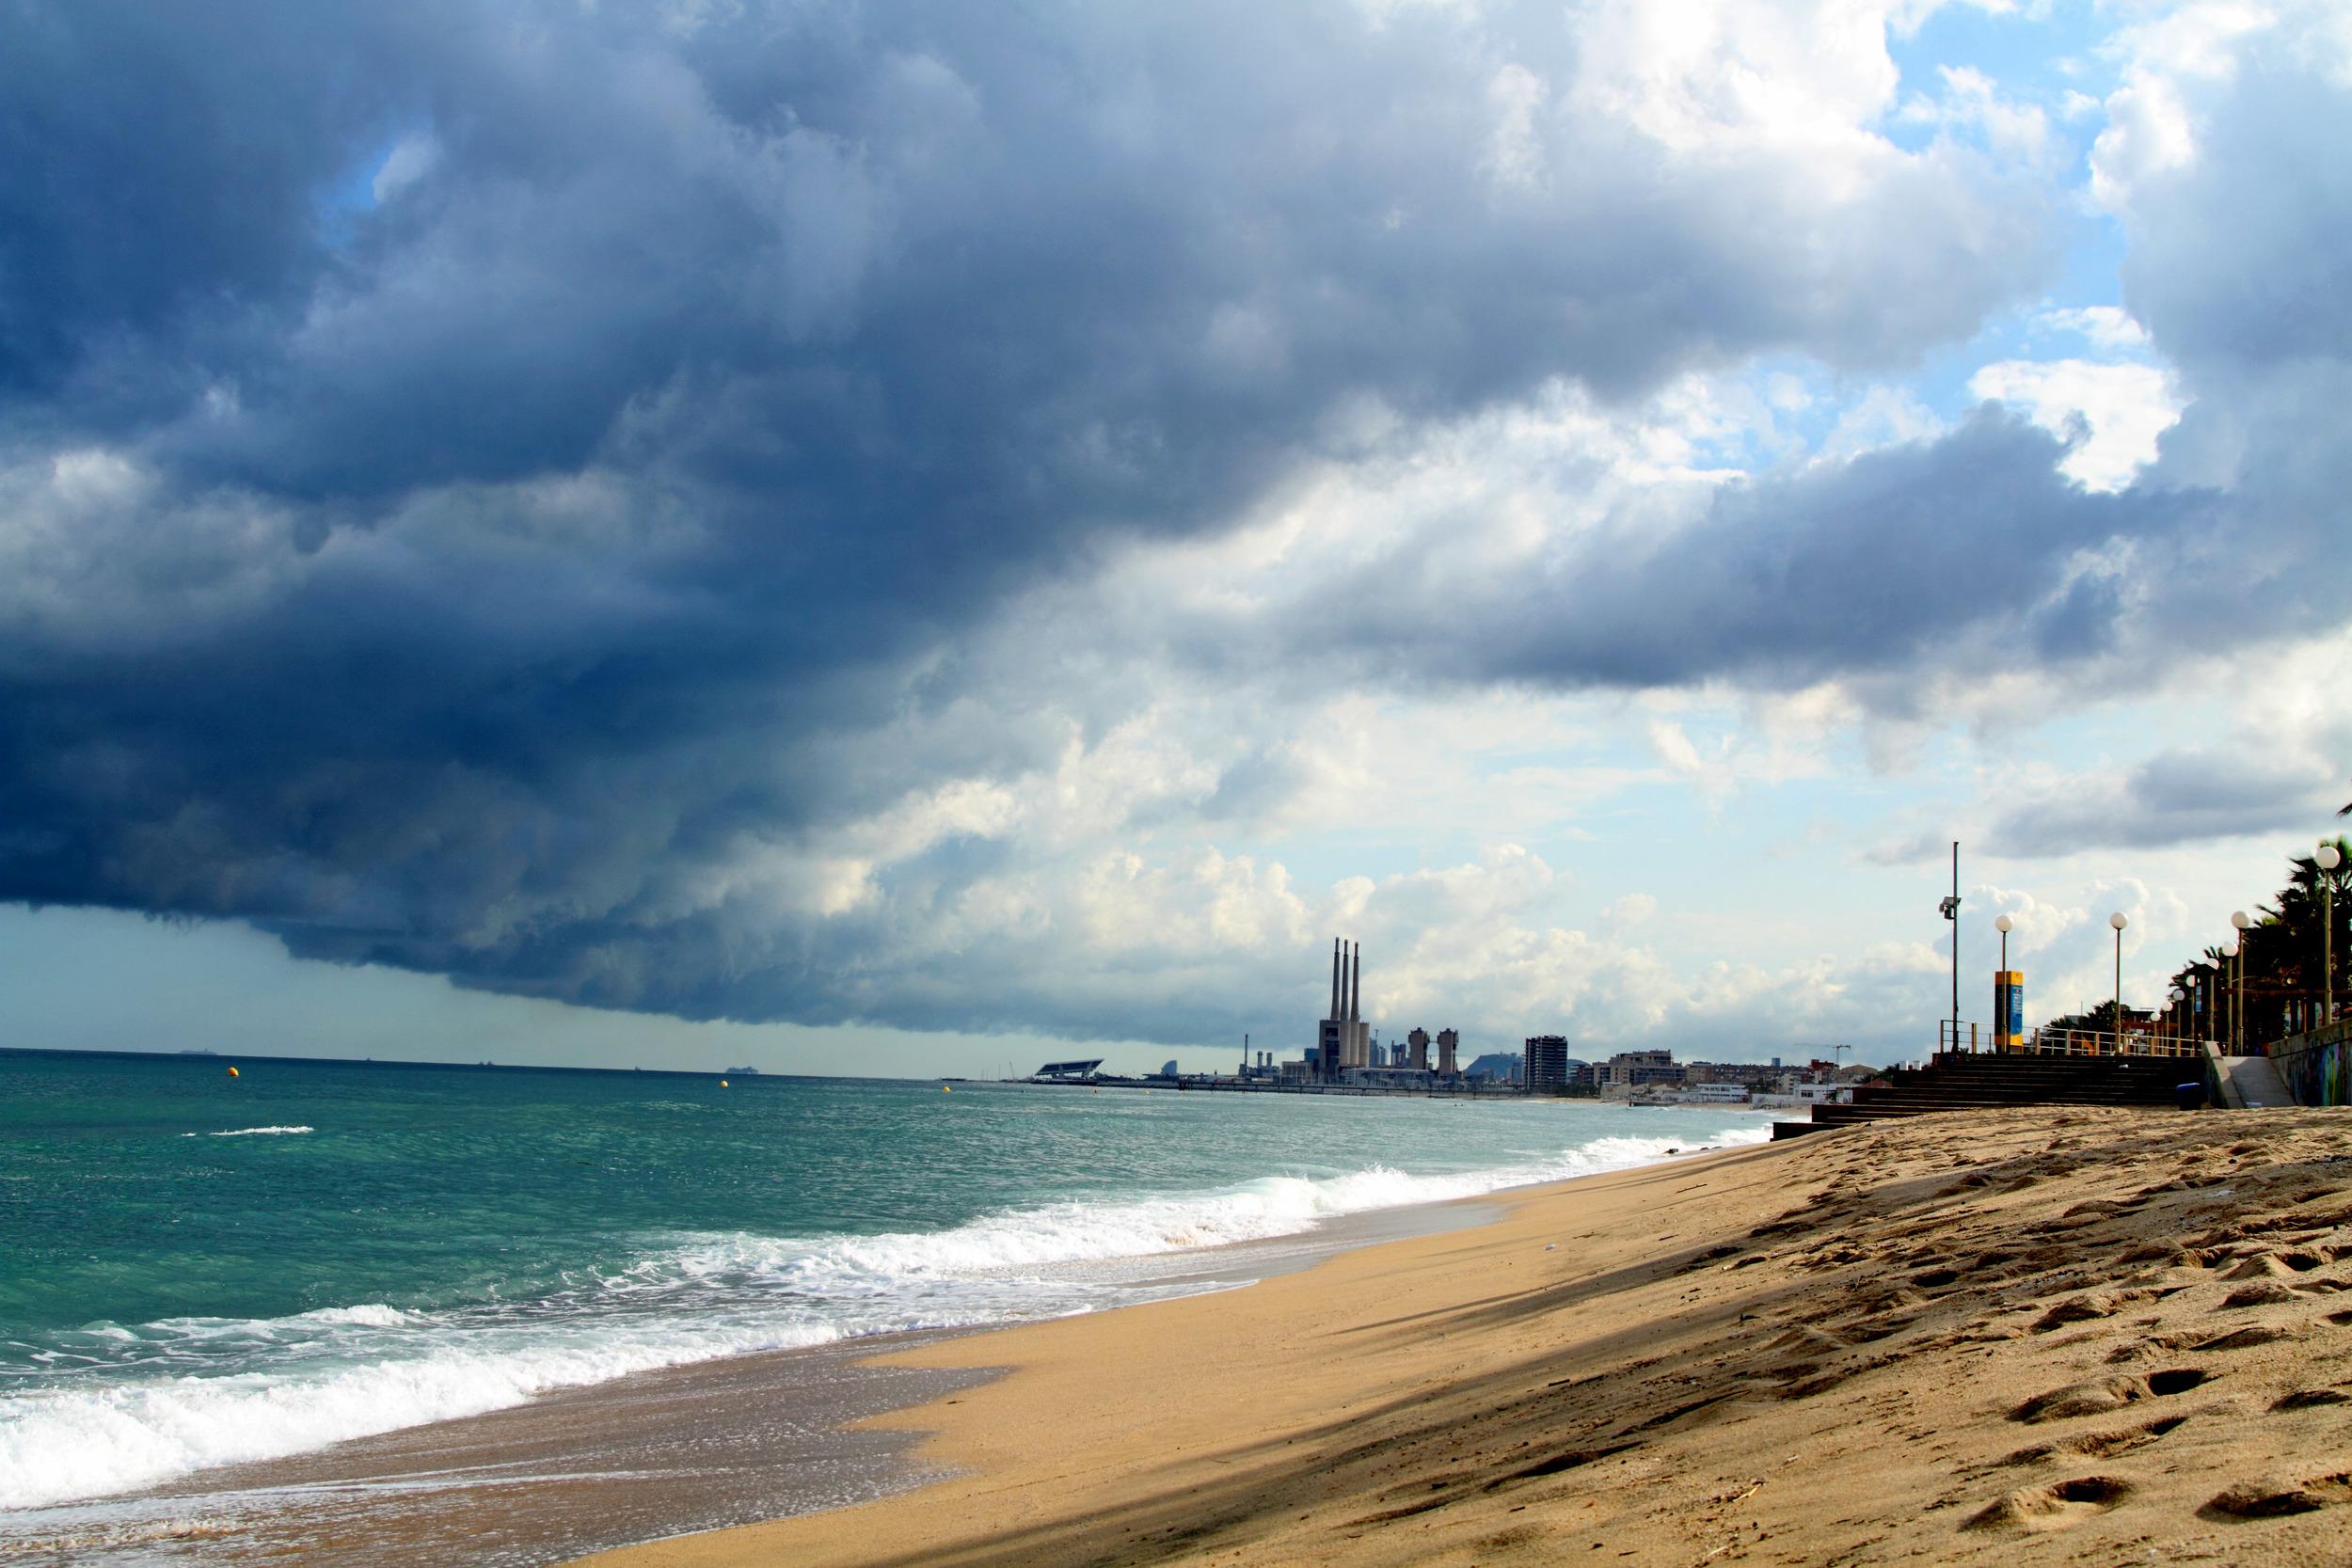 SPAIN_RAIN CLOUDS_SHORELINE OCEAN_CITY BACKGRouND_2.jpg